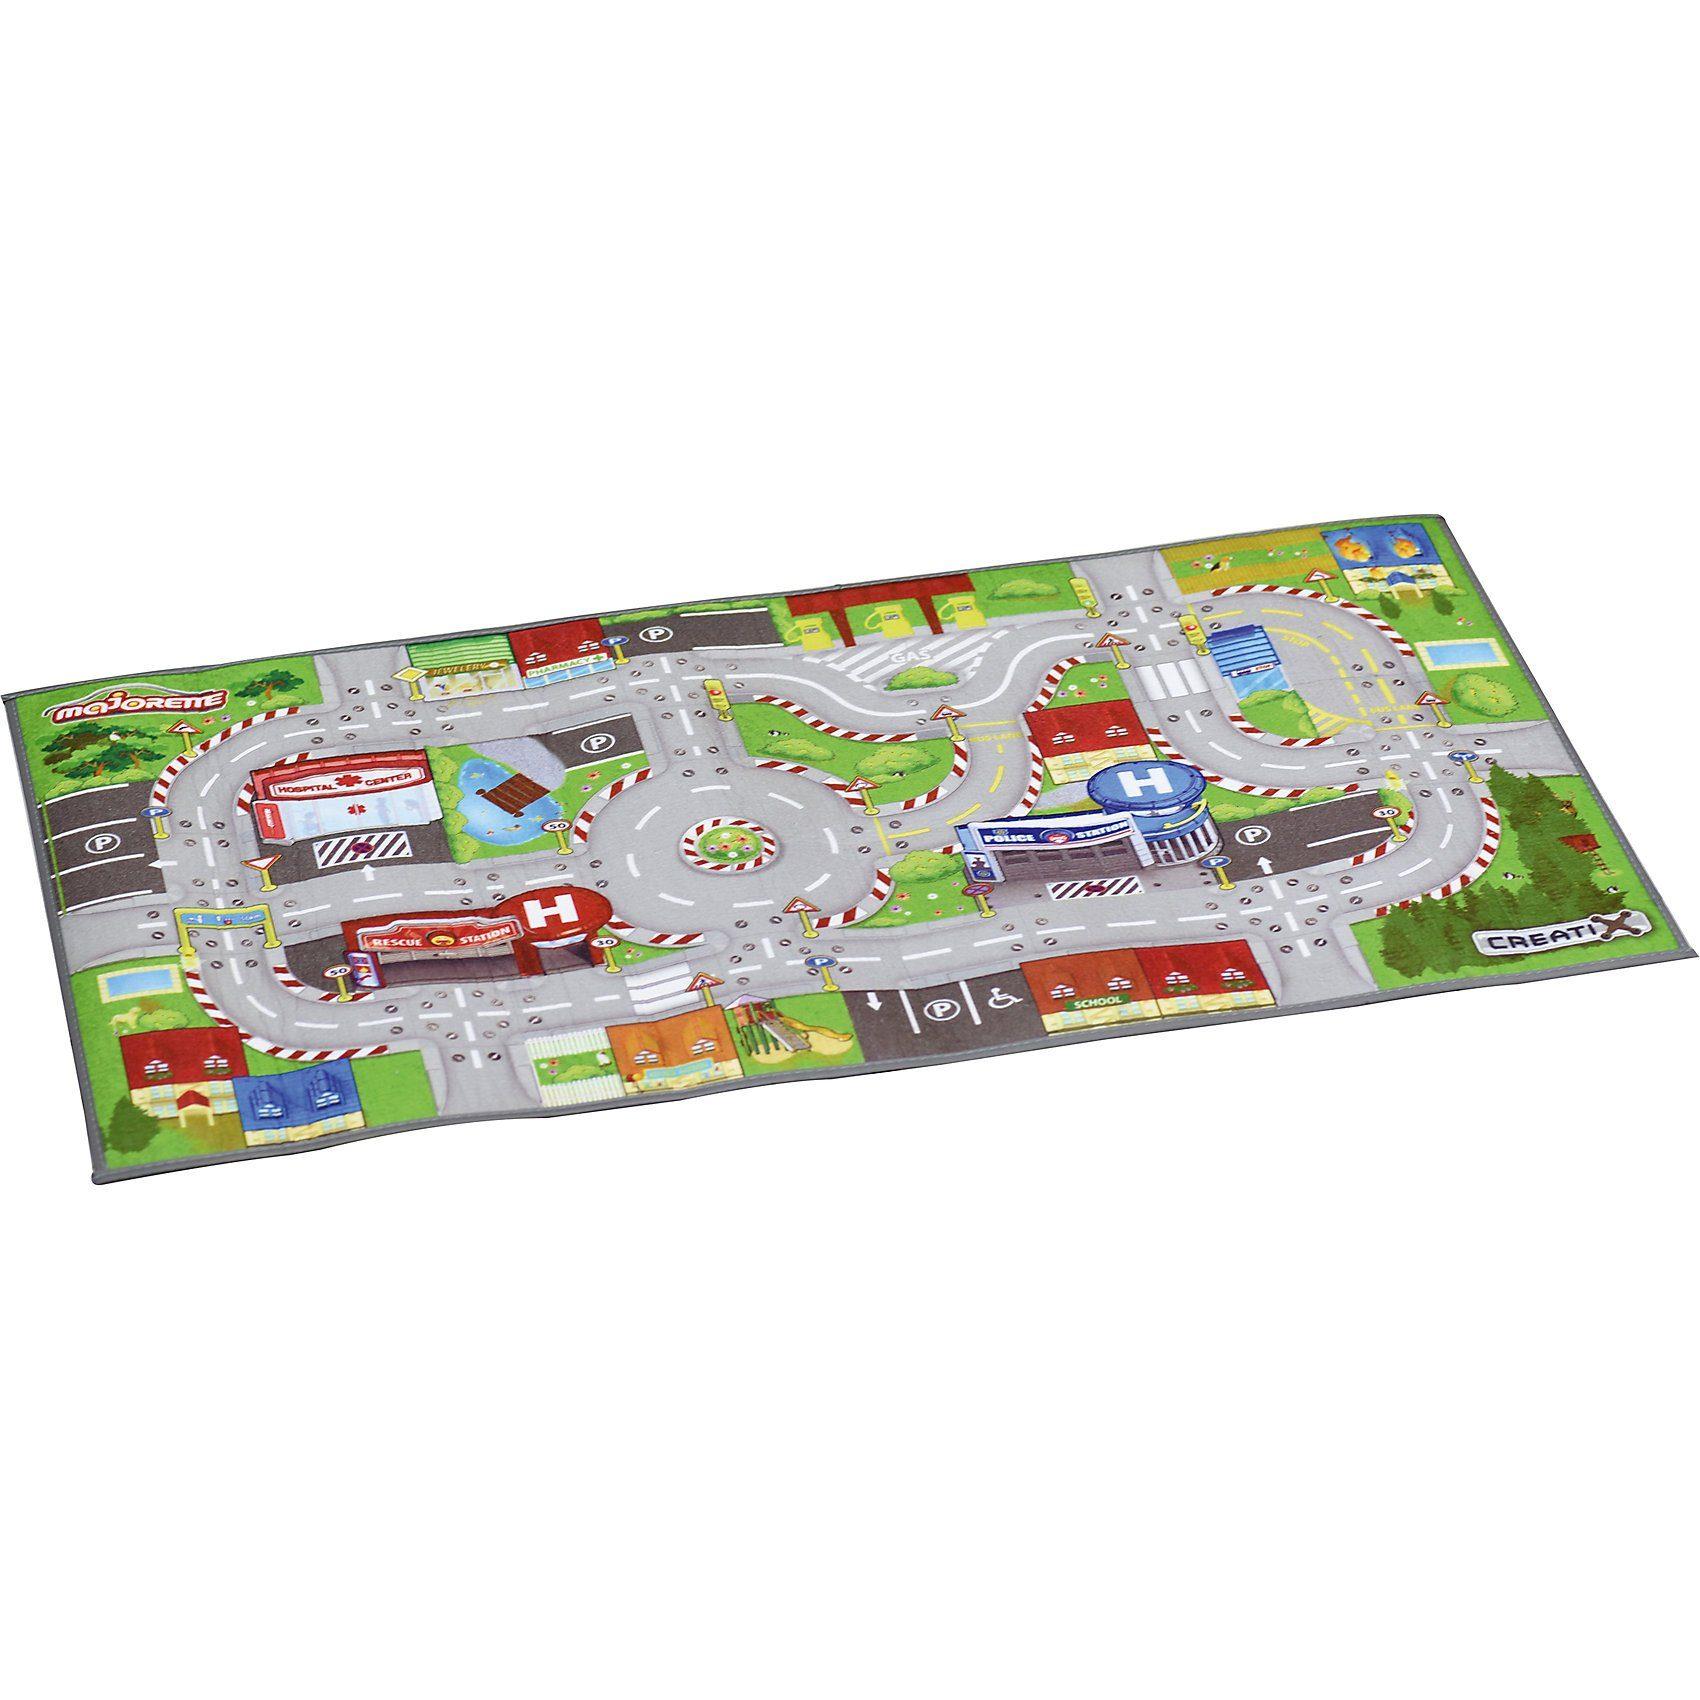 majORETTE Creatix Playmat Rettungsfahrzeuge/Stadt